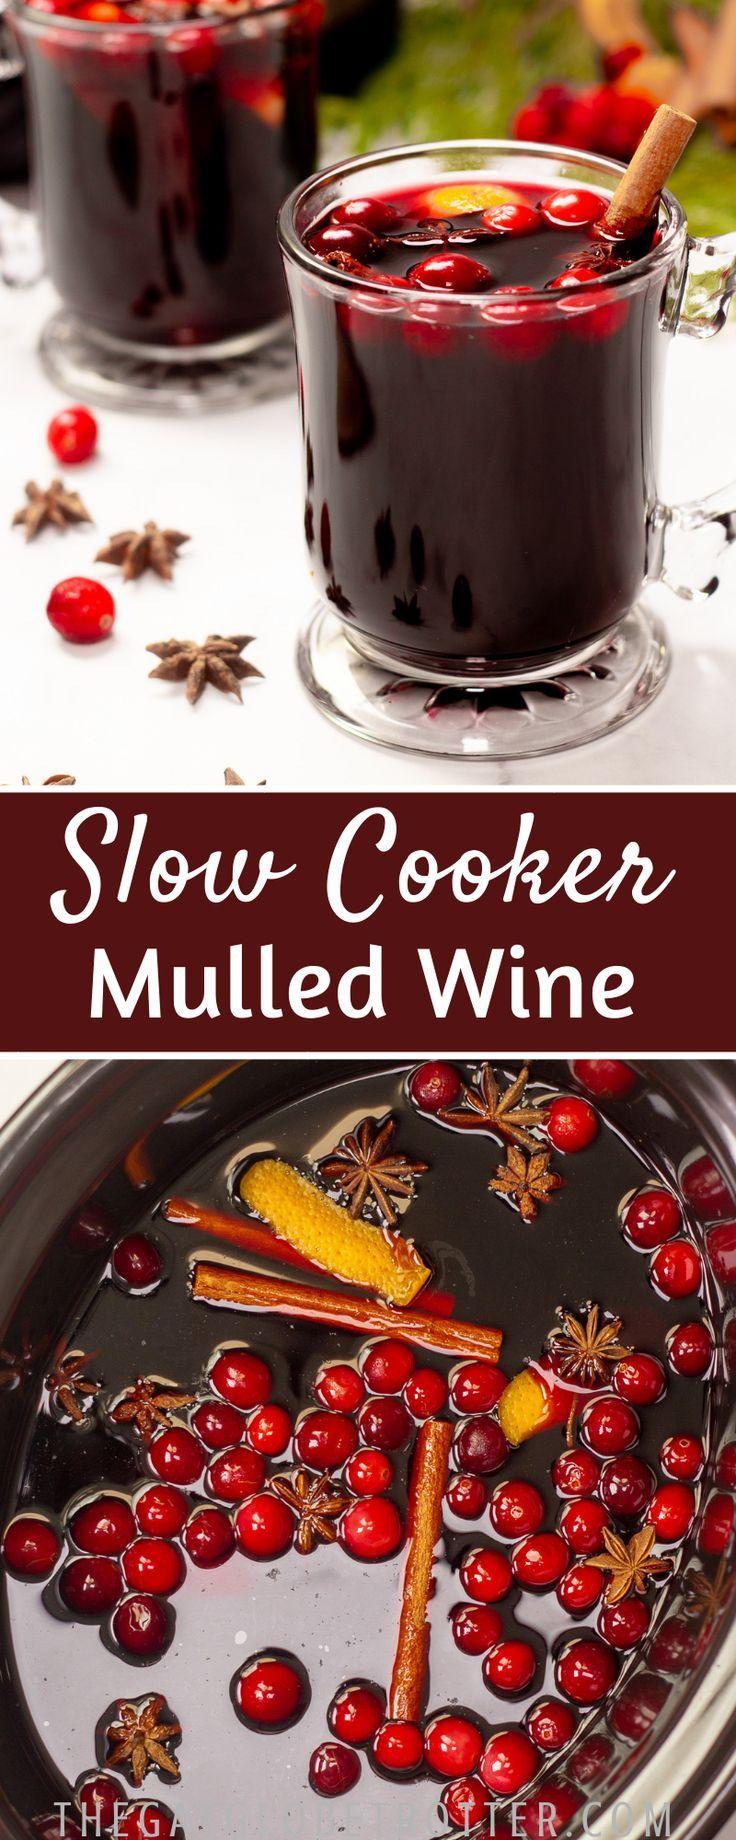 Slow Cooker Mulled Wine Mulled Wine Slow Cooker Mulled Wine Recipe Crockpot Holiday Favorite Recipes